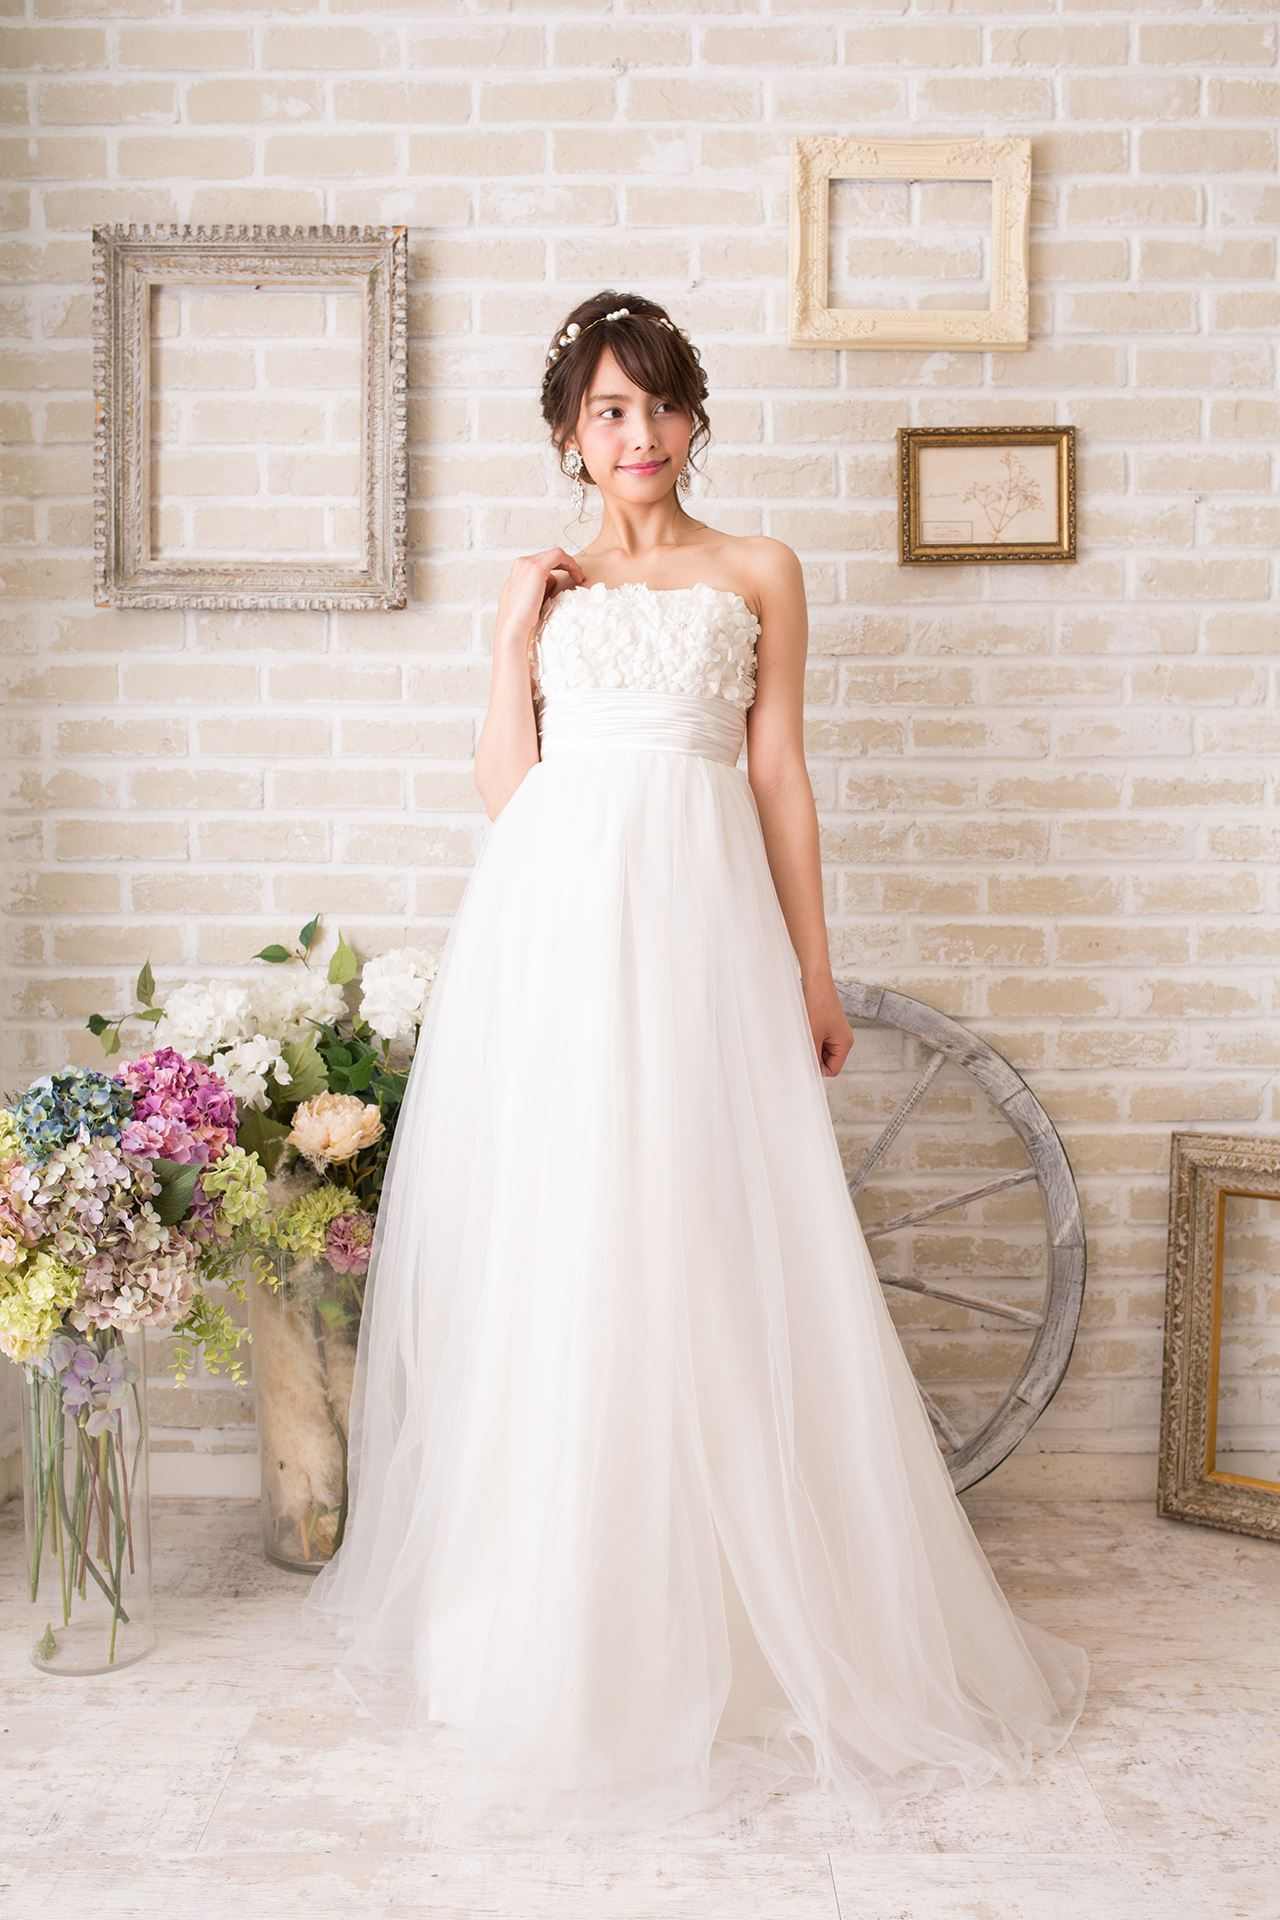 yk_nr_dress_374